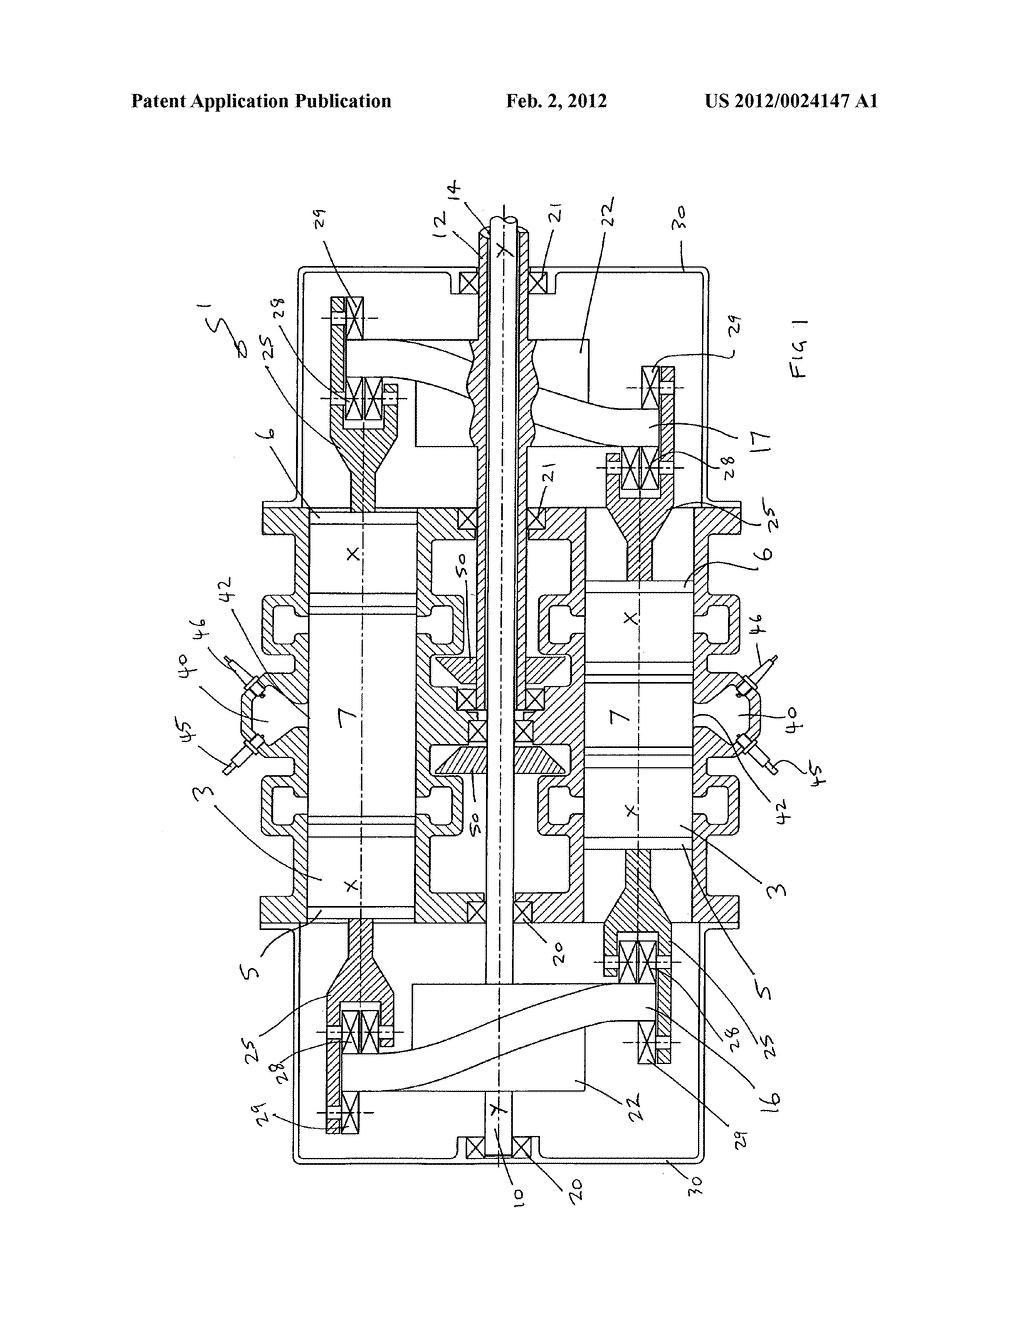 Wrg Axial Engine Diagram